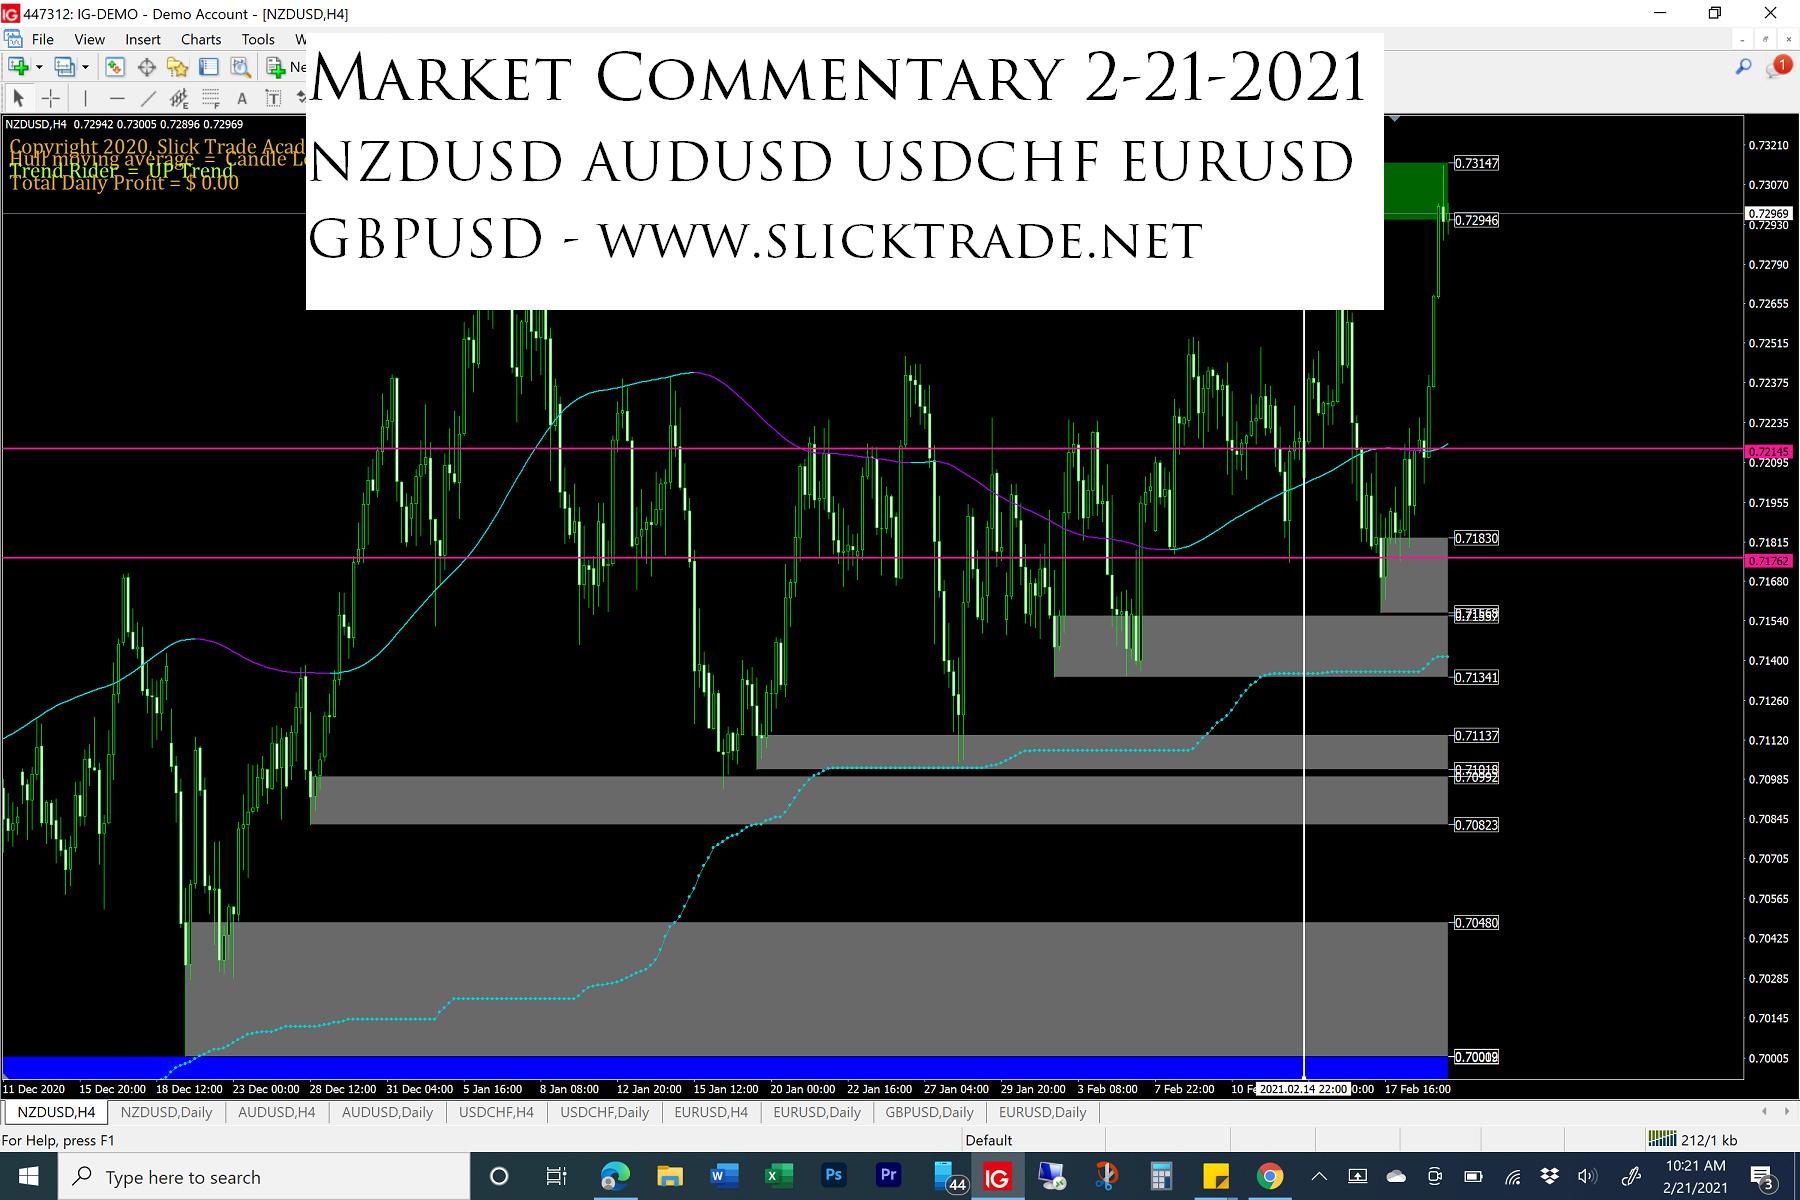 Market Commentary 2-21-2021 - NZDUSD AUDUSD USDCHF EURUSD GBPUSD